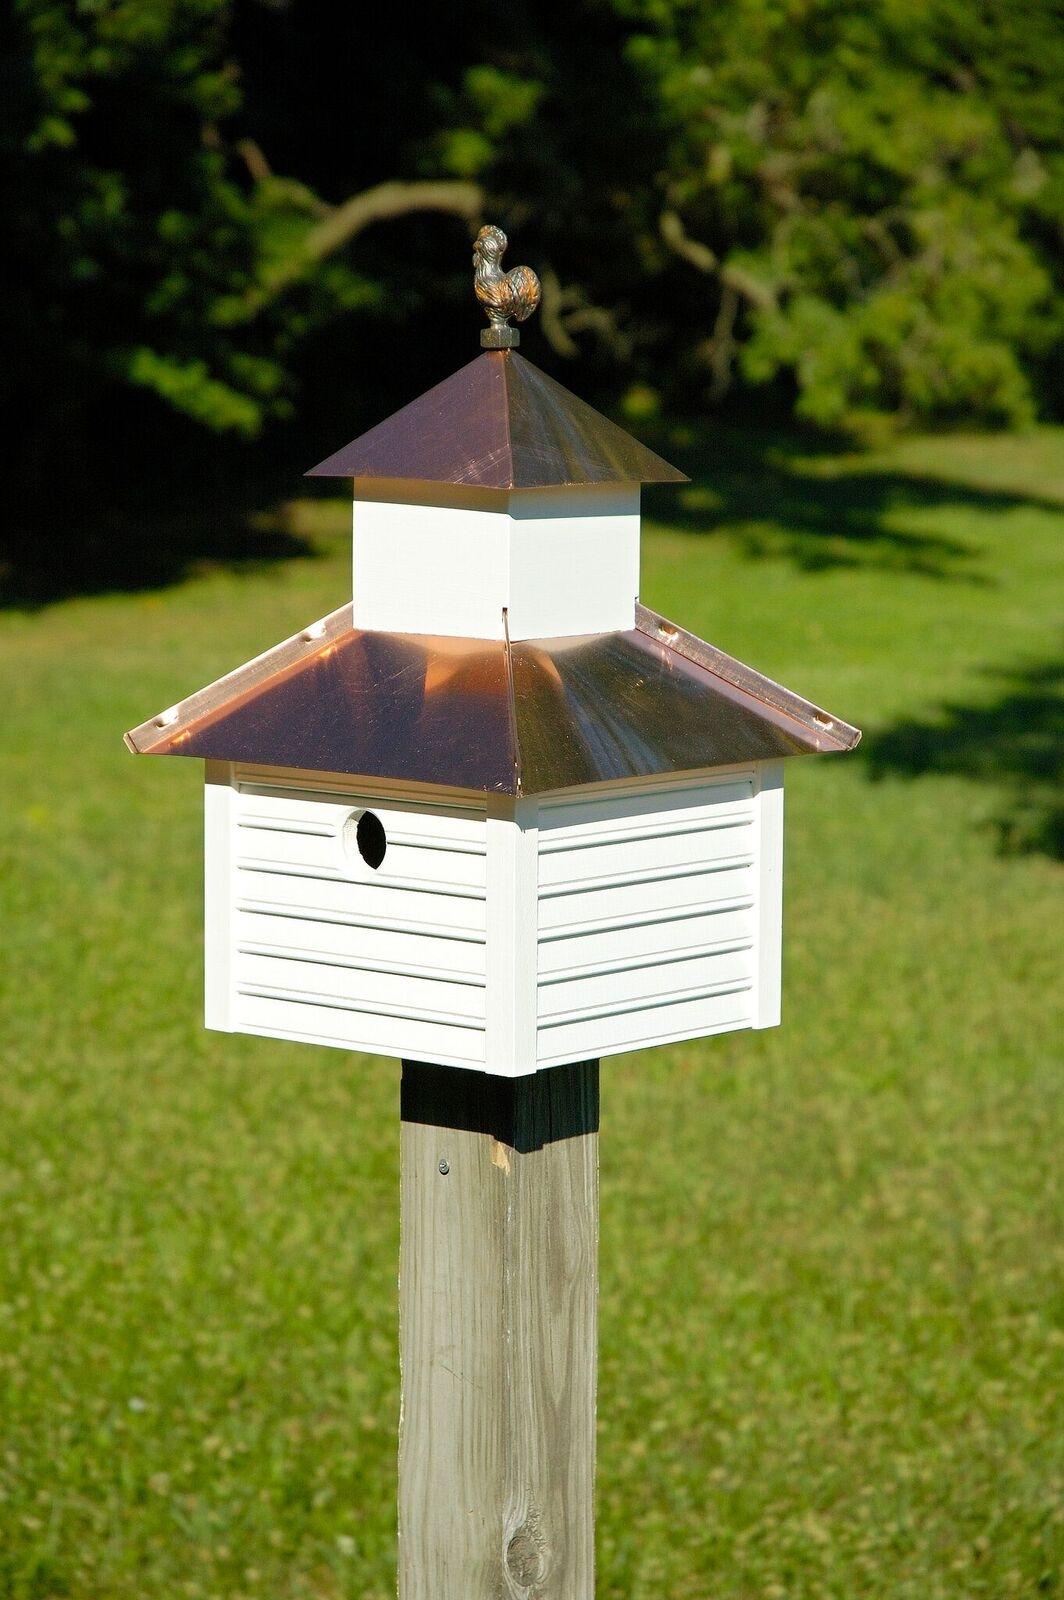 Birdhouse Product Photo